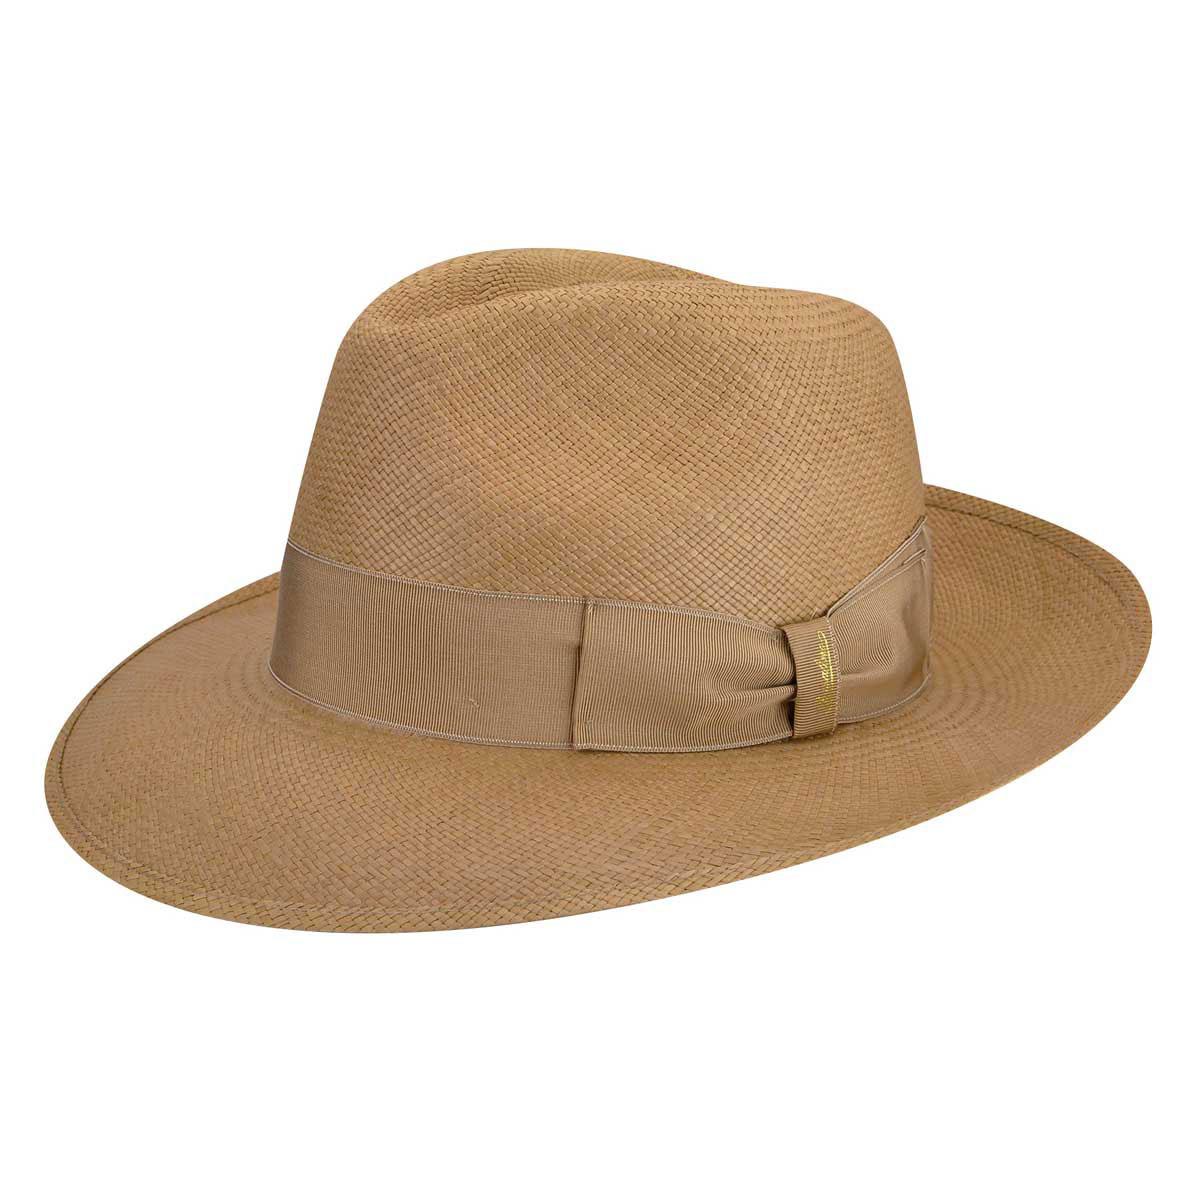 1940s Mens Hat Styles and History 141088 Quito Panama Large Brim Fedora $268.00 AT vintagedancer.com